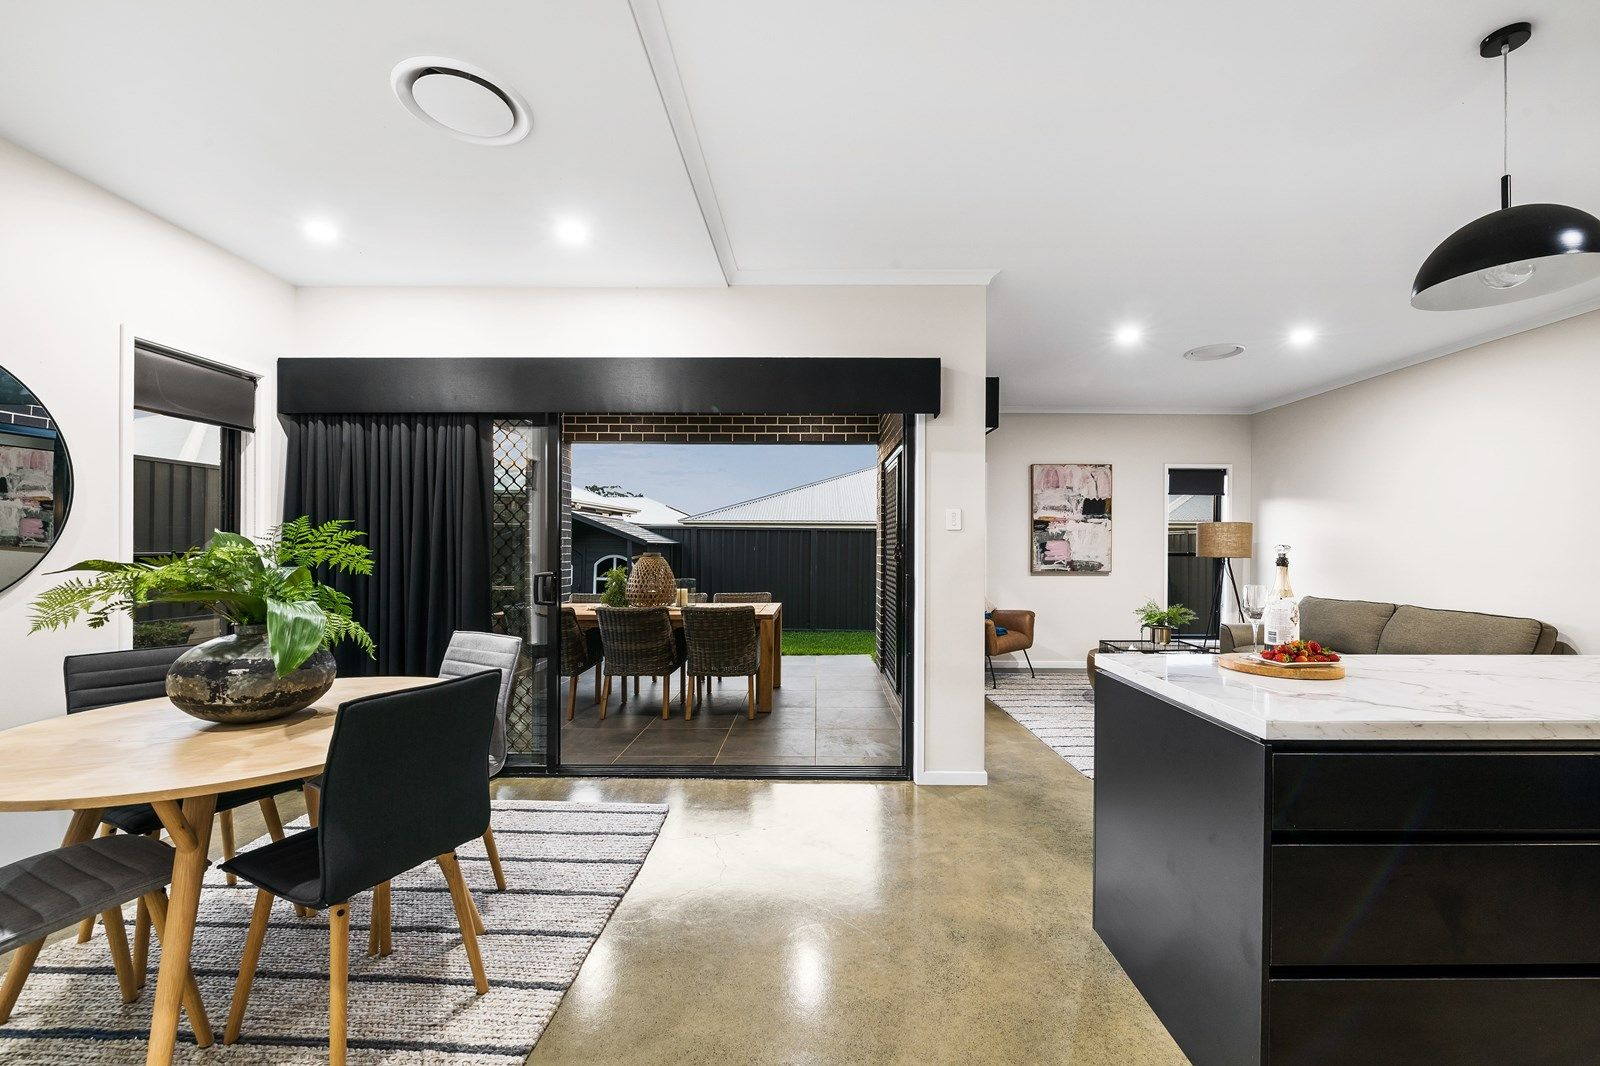 226-232 Hursley Road, Glenvale, QLD 4350, Image 0